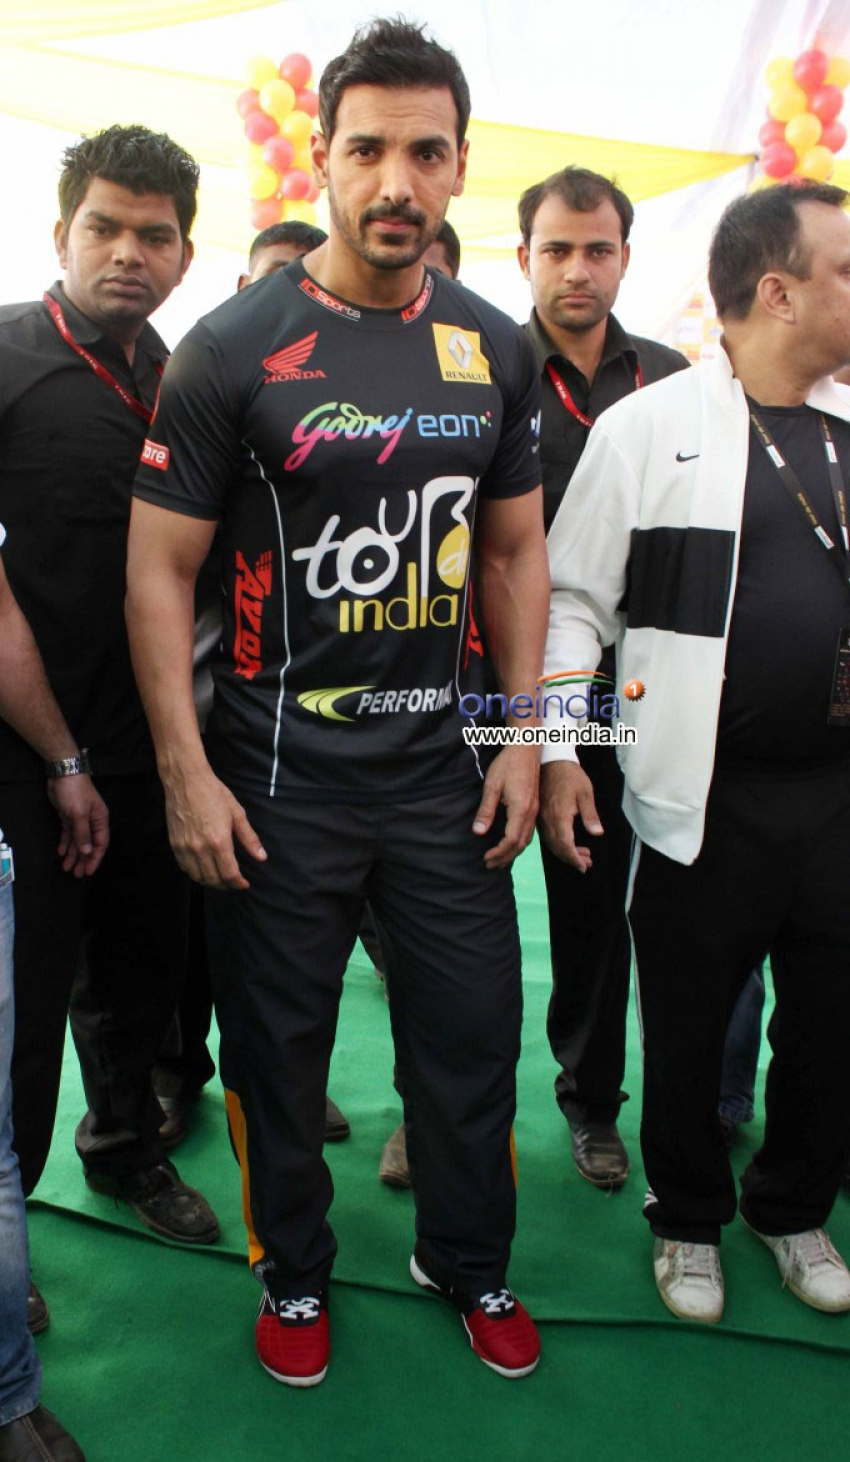 Godrej Eon Tour de India 2013 Photos